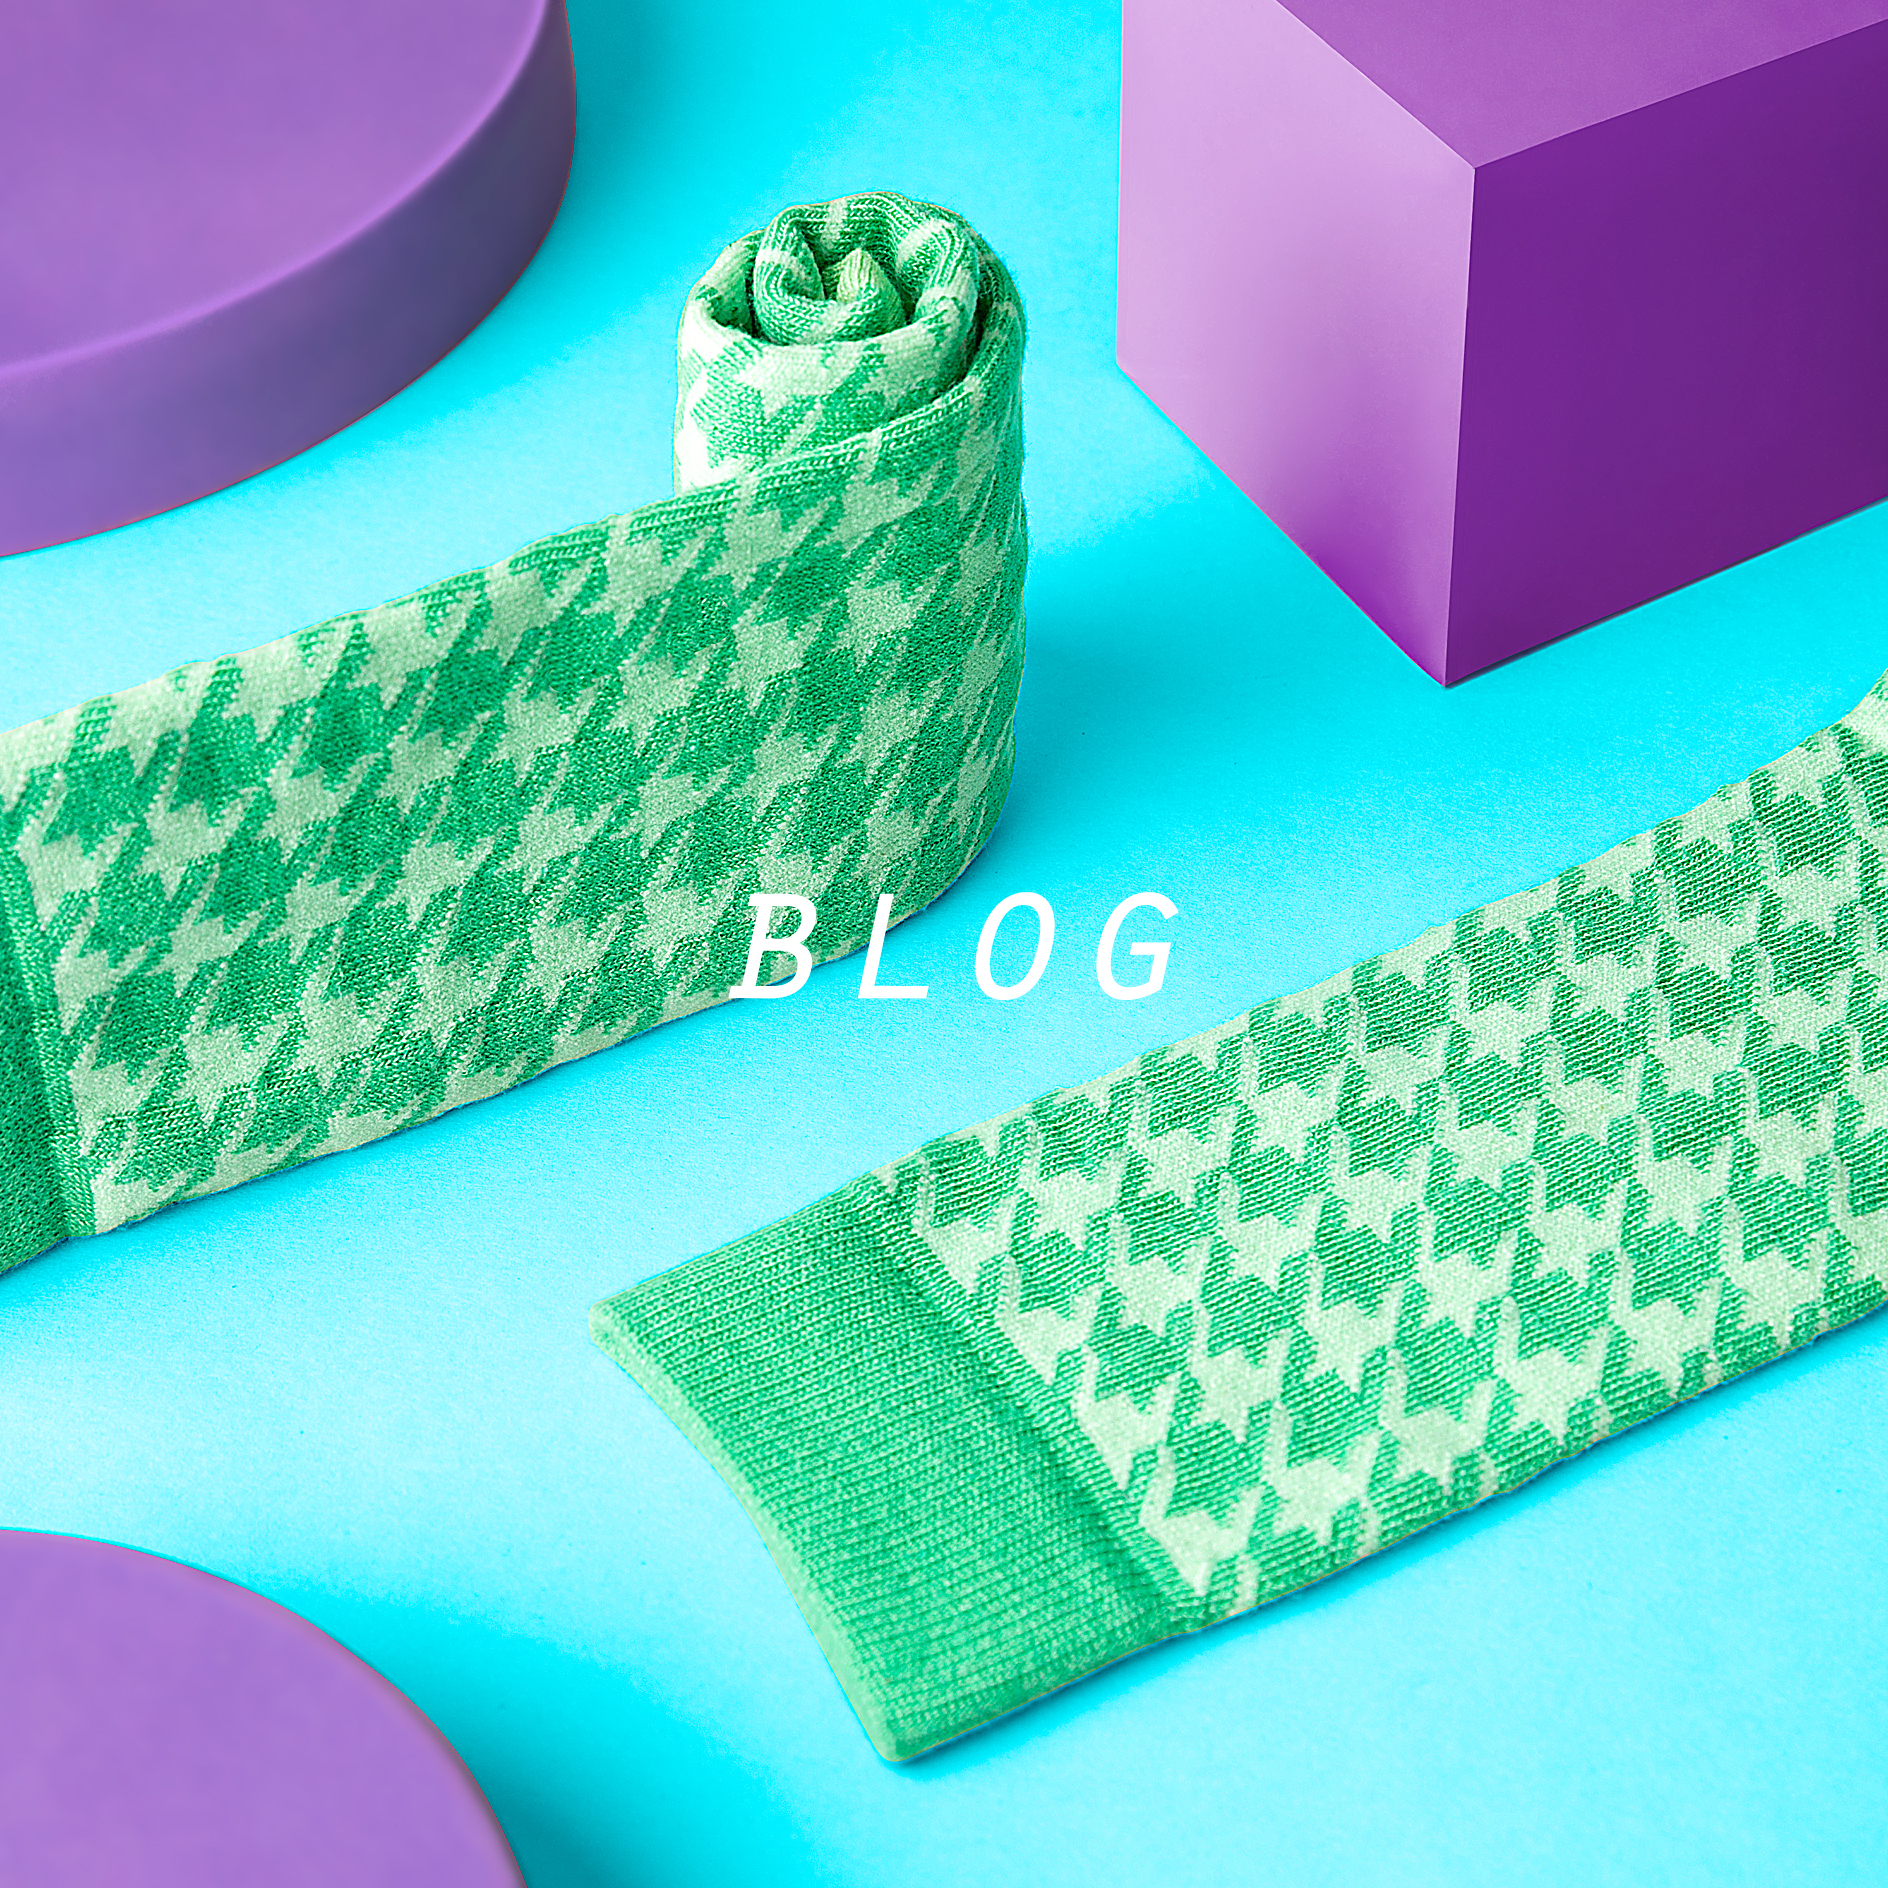 sotb_blog-socks-on-the-beat